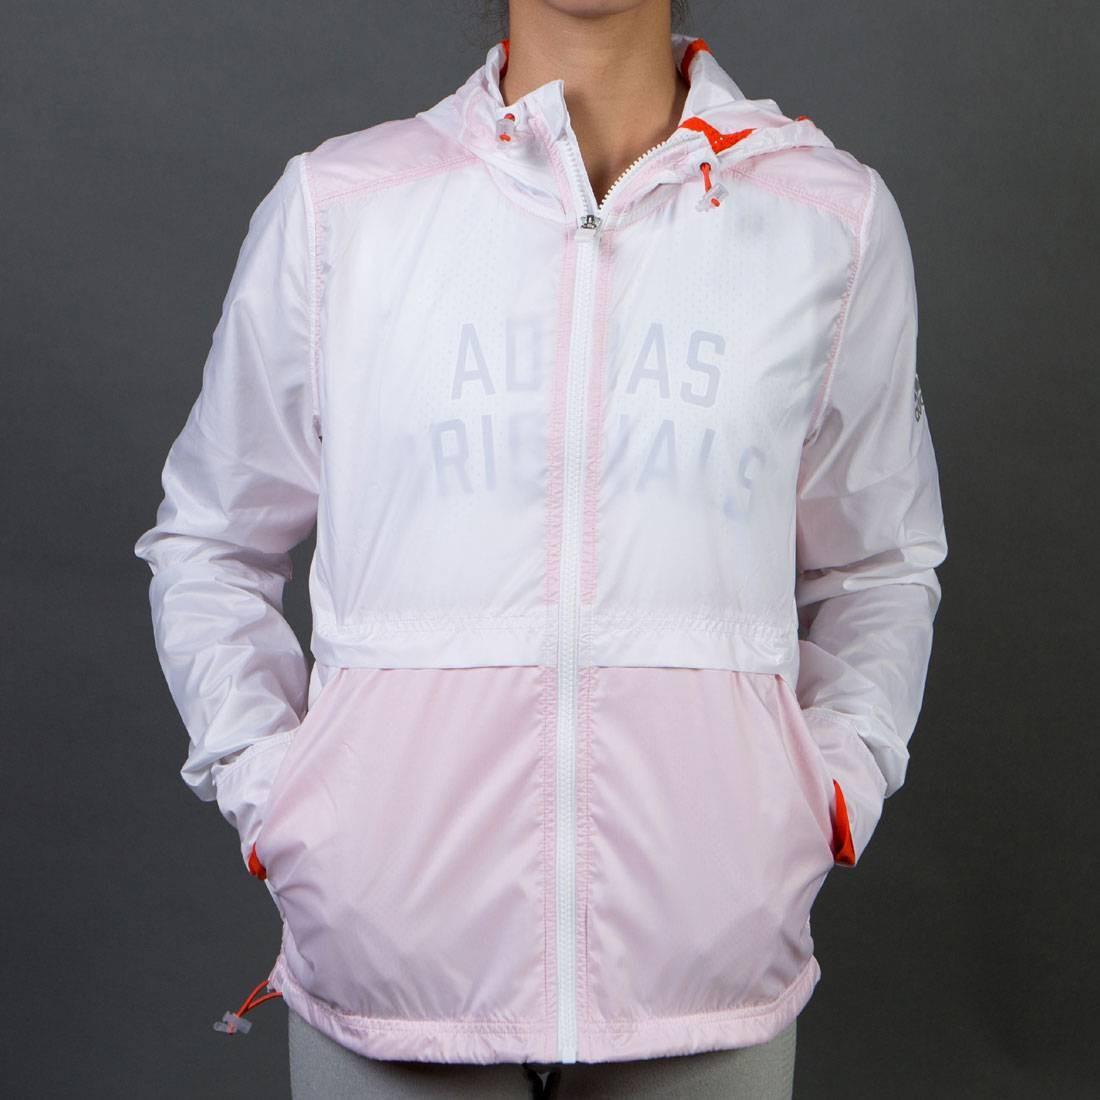 Adidas Women Clear Goals Jacket (white)